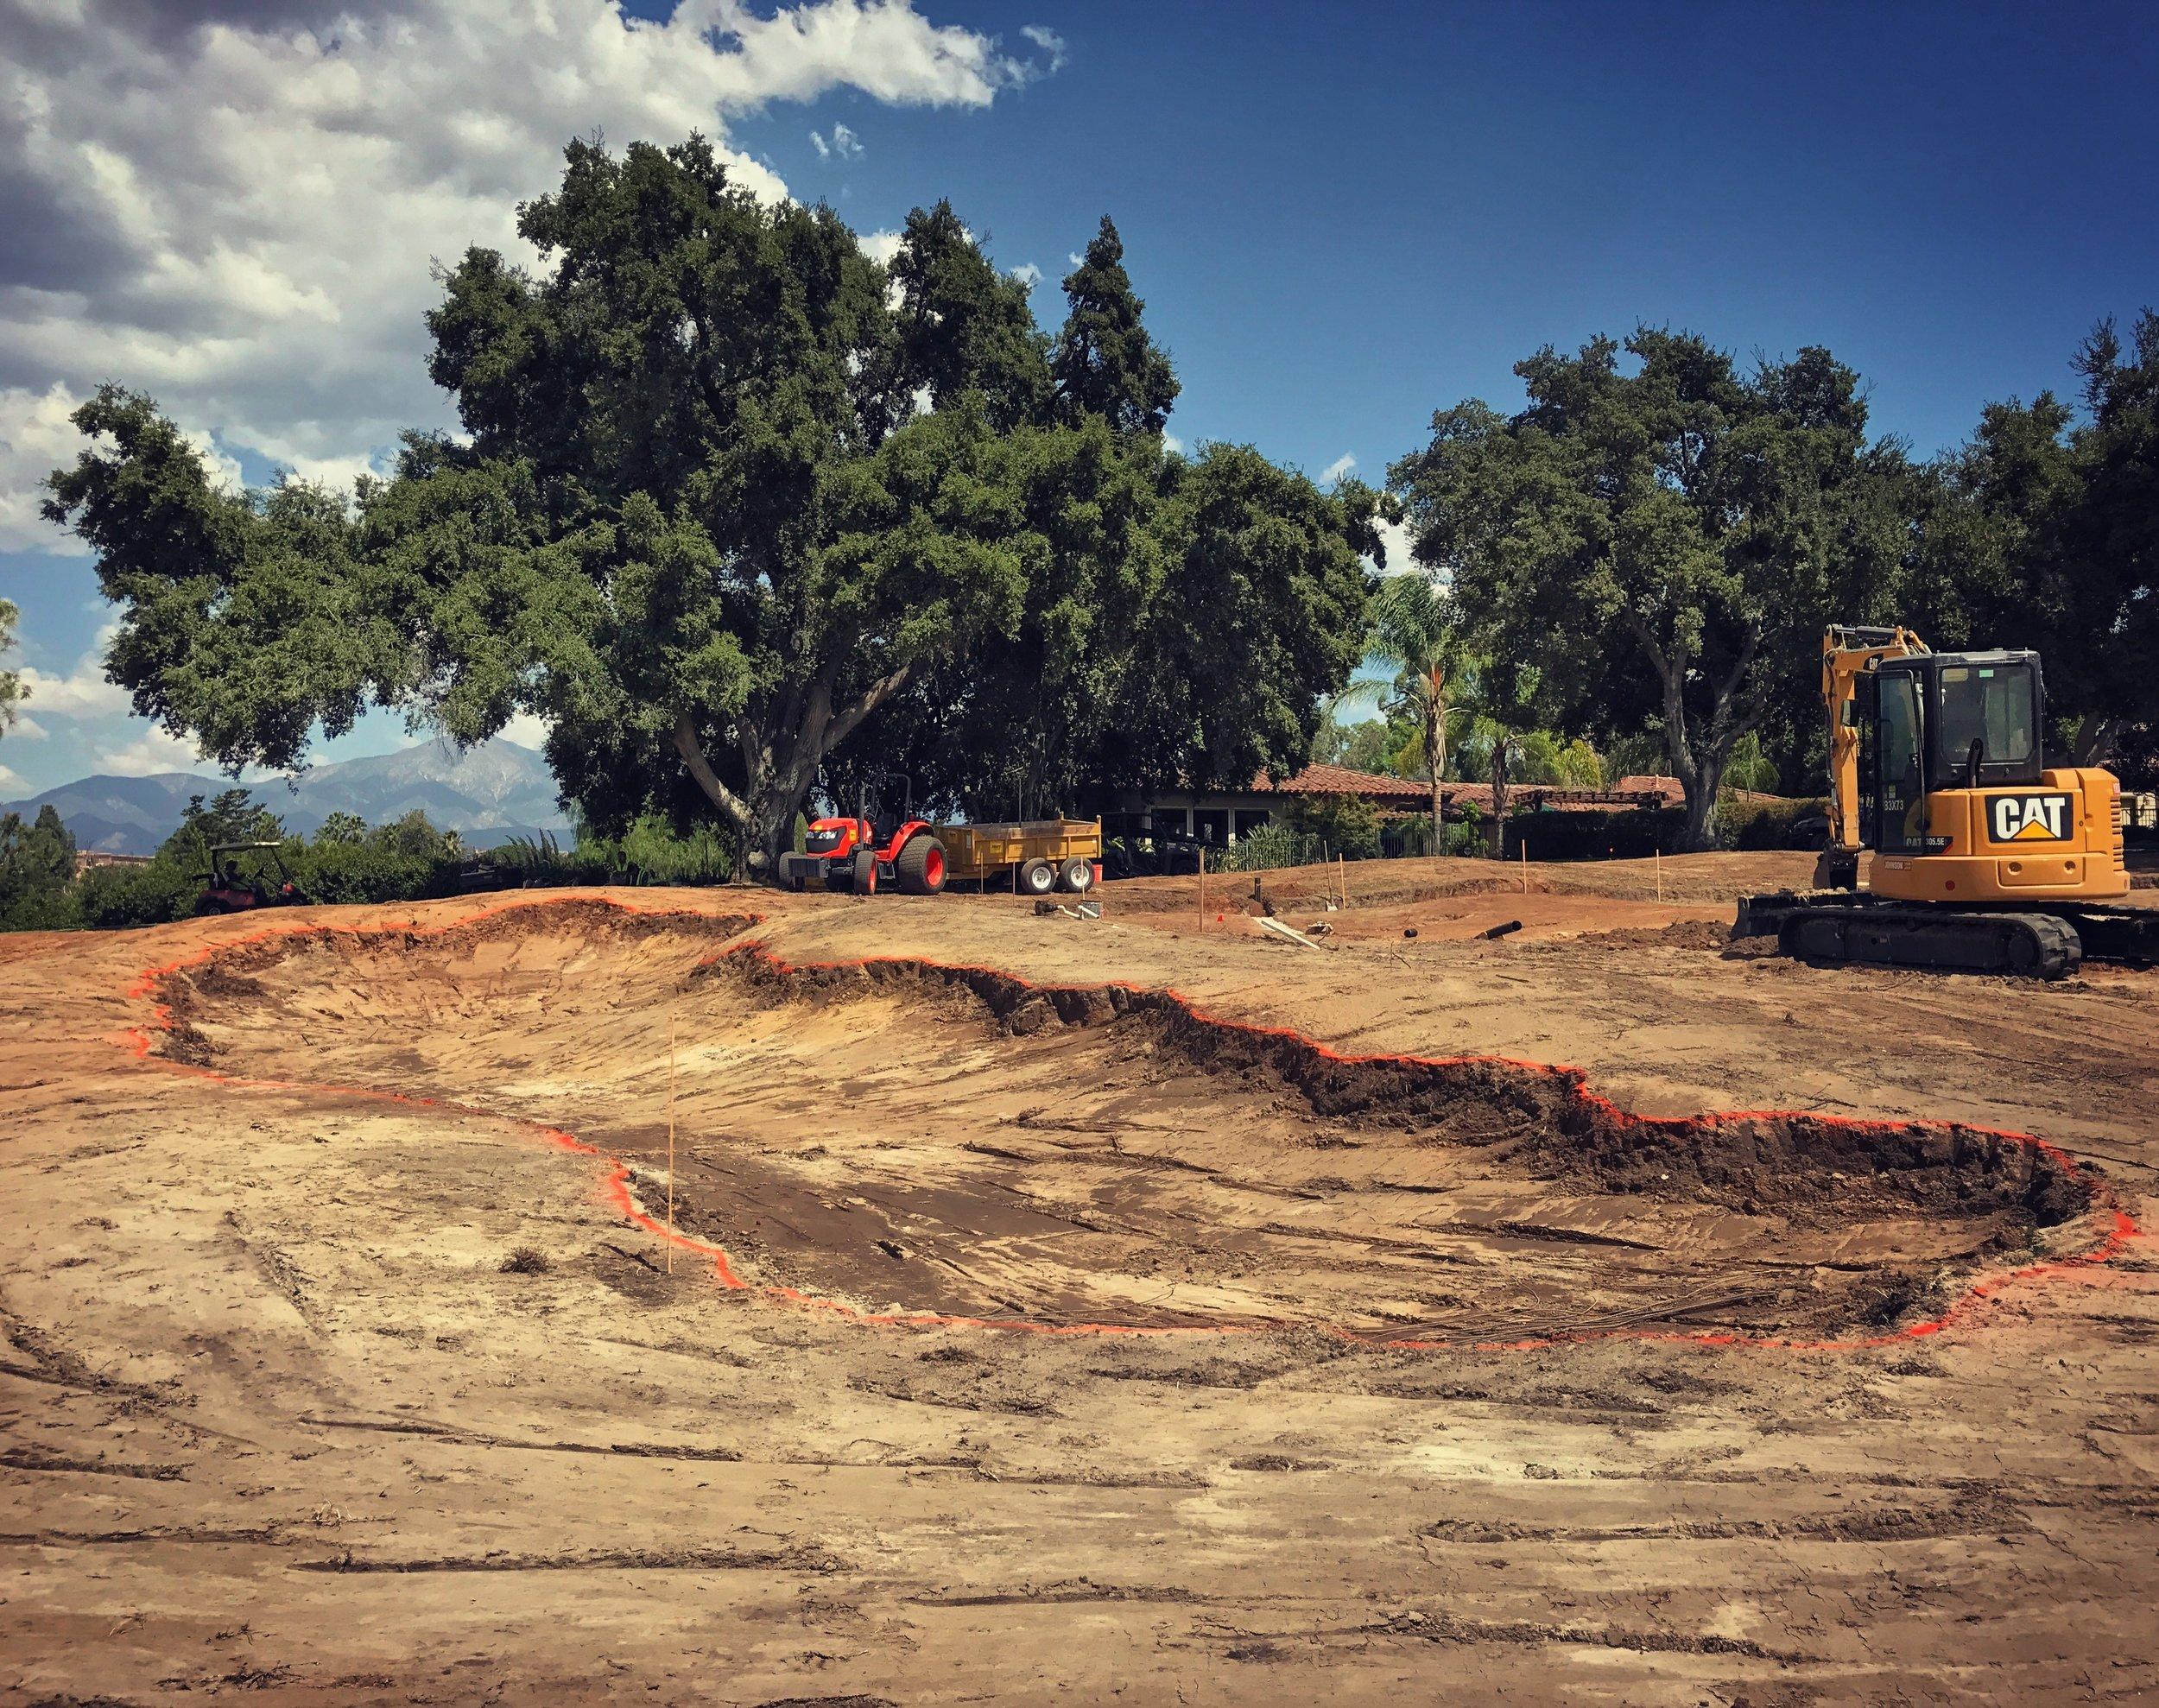 hochstein-design-2017-the-work-redlands-hole-2-left-bunker-shaped.jpg